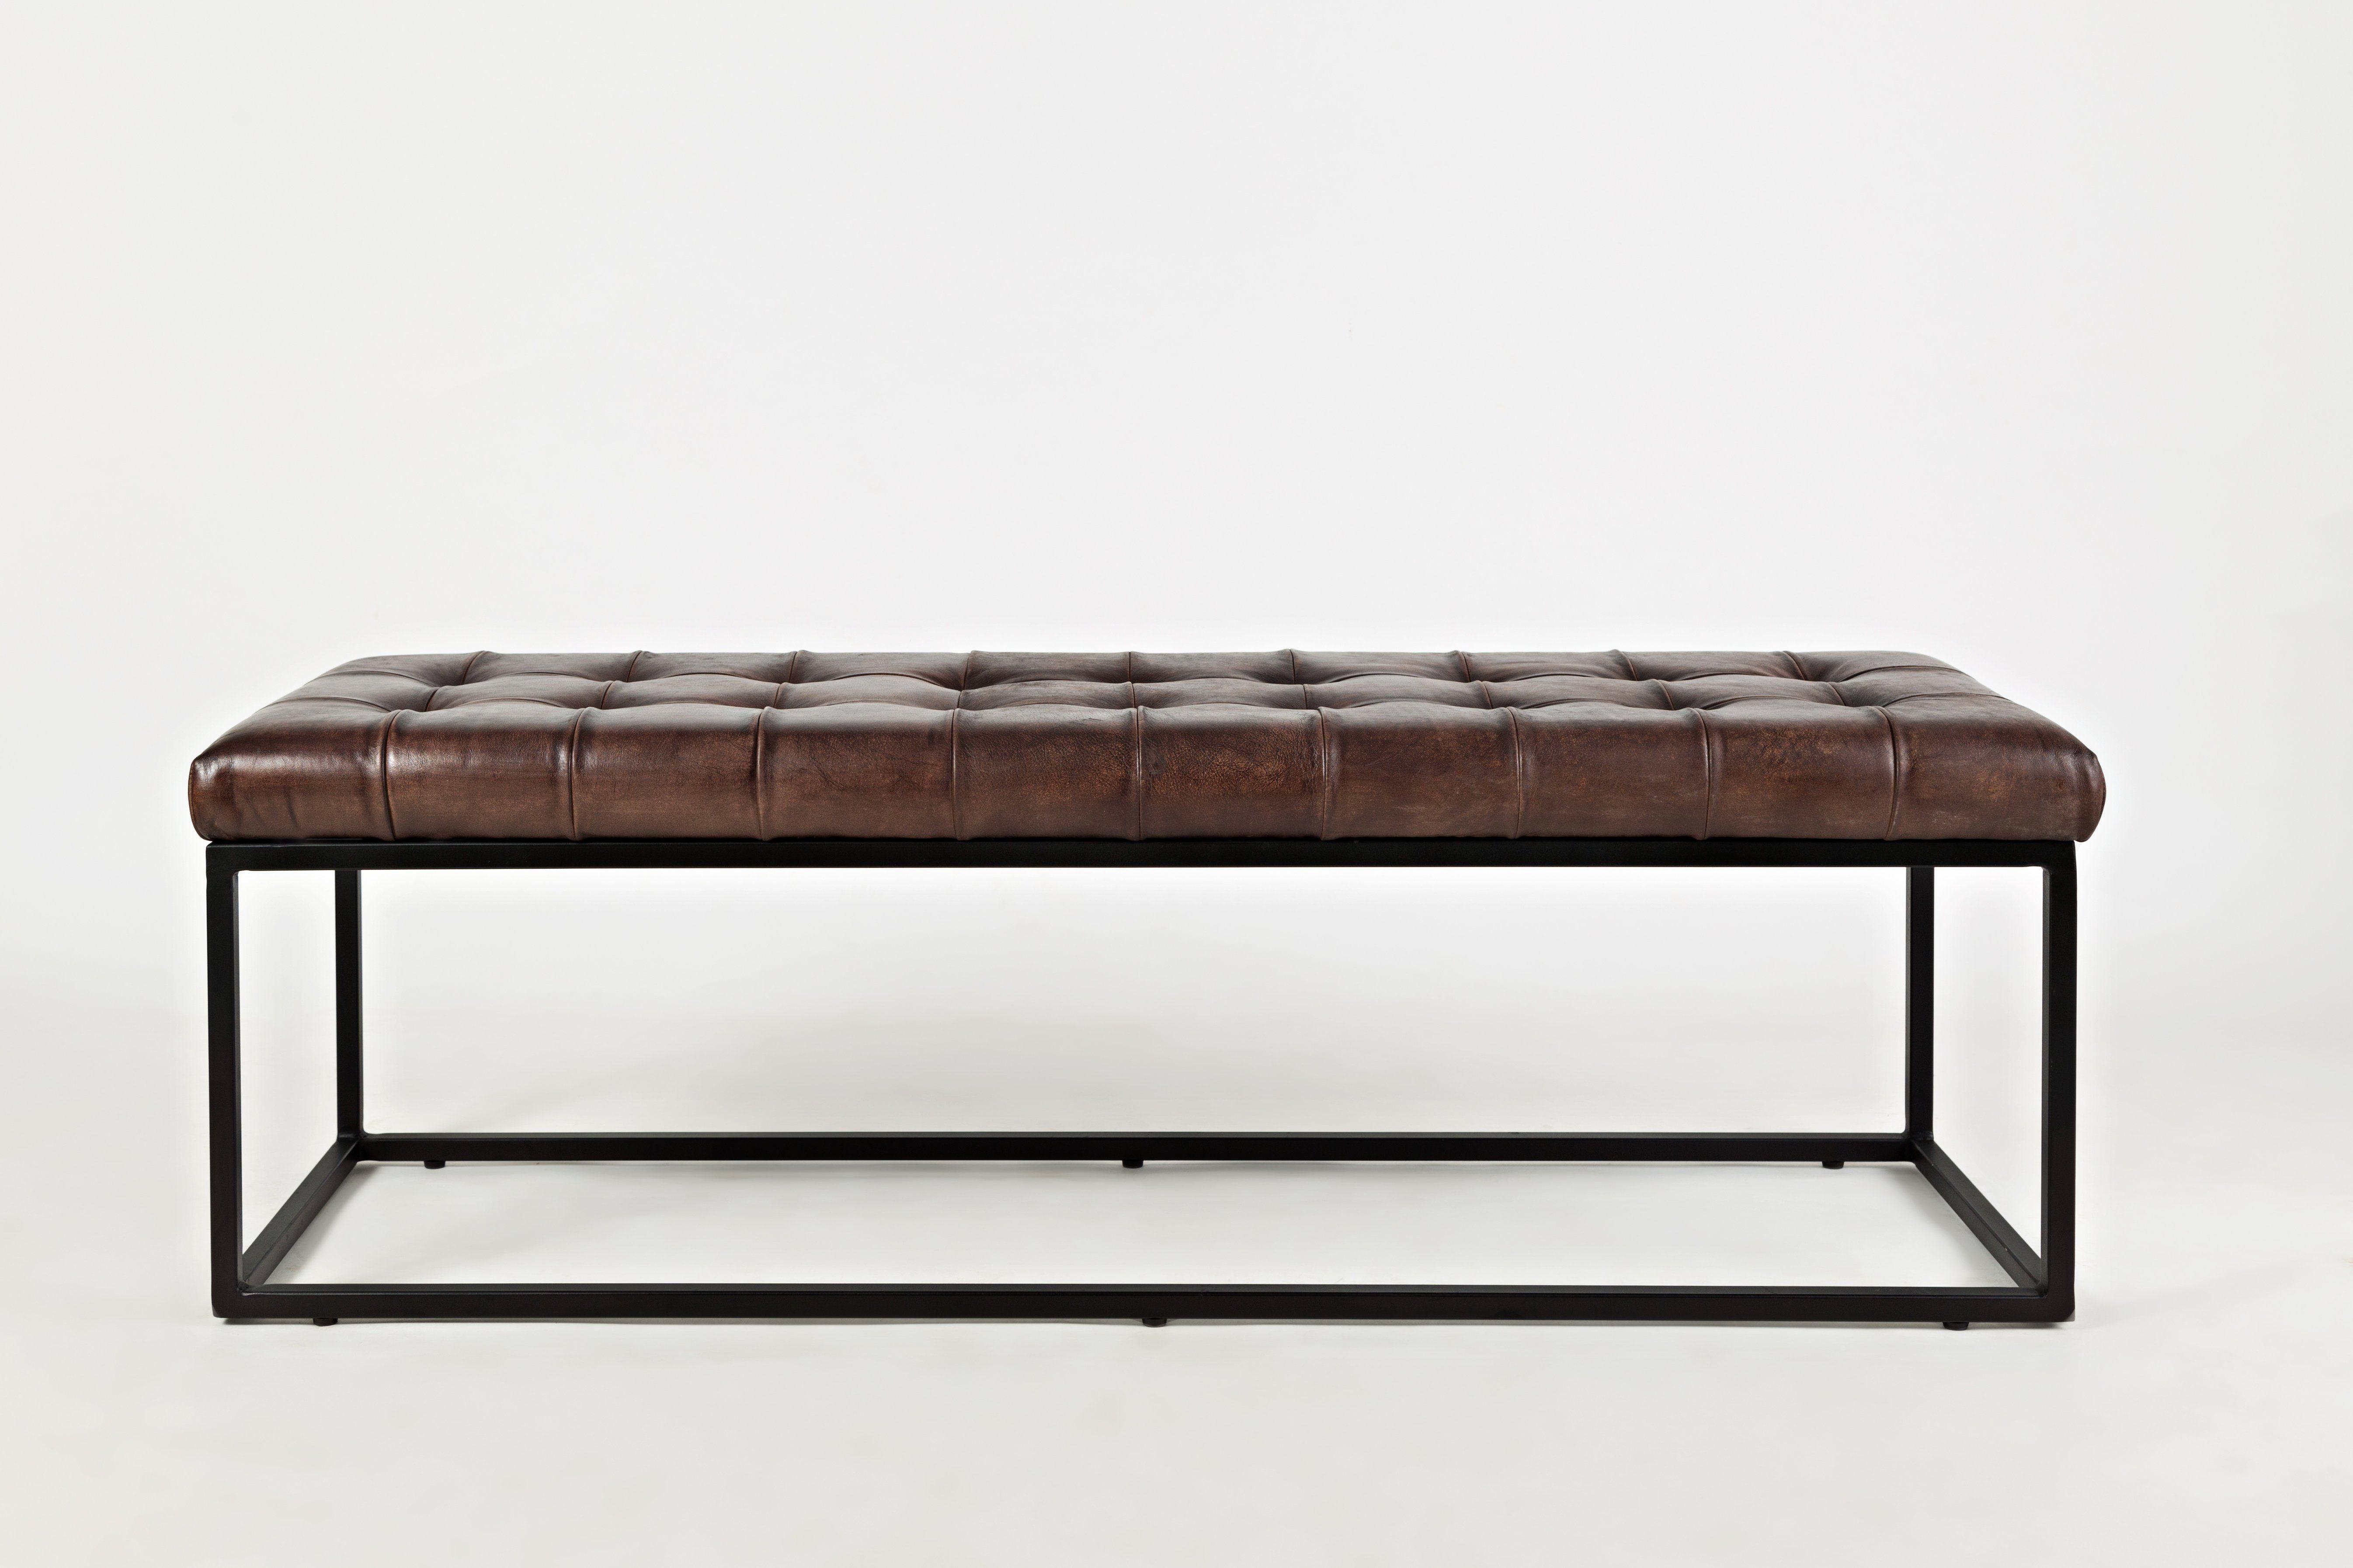 Leather Upholestered Metal Ottoman Dark Sienna Leather Ottoman Metal Ottomans Living Room Leather [ 3588 x 5383 Pixel ]